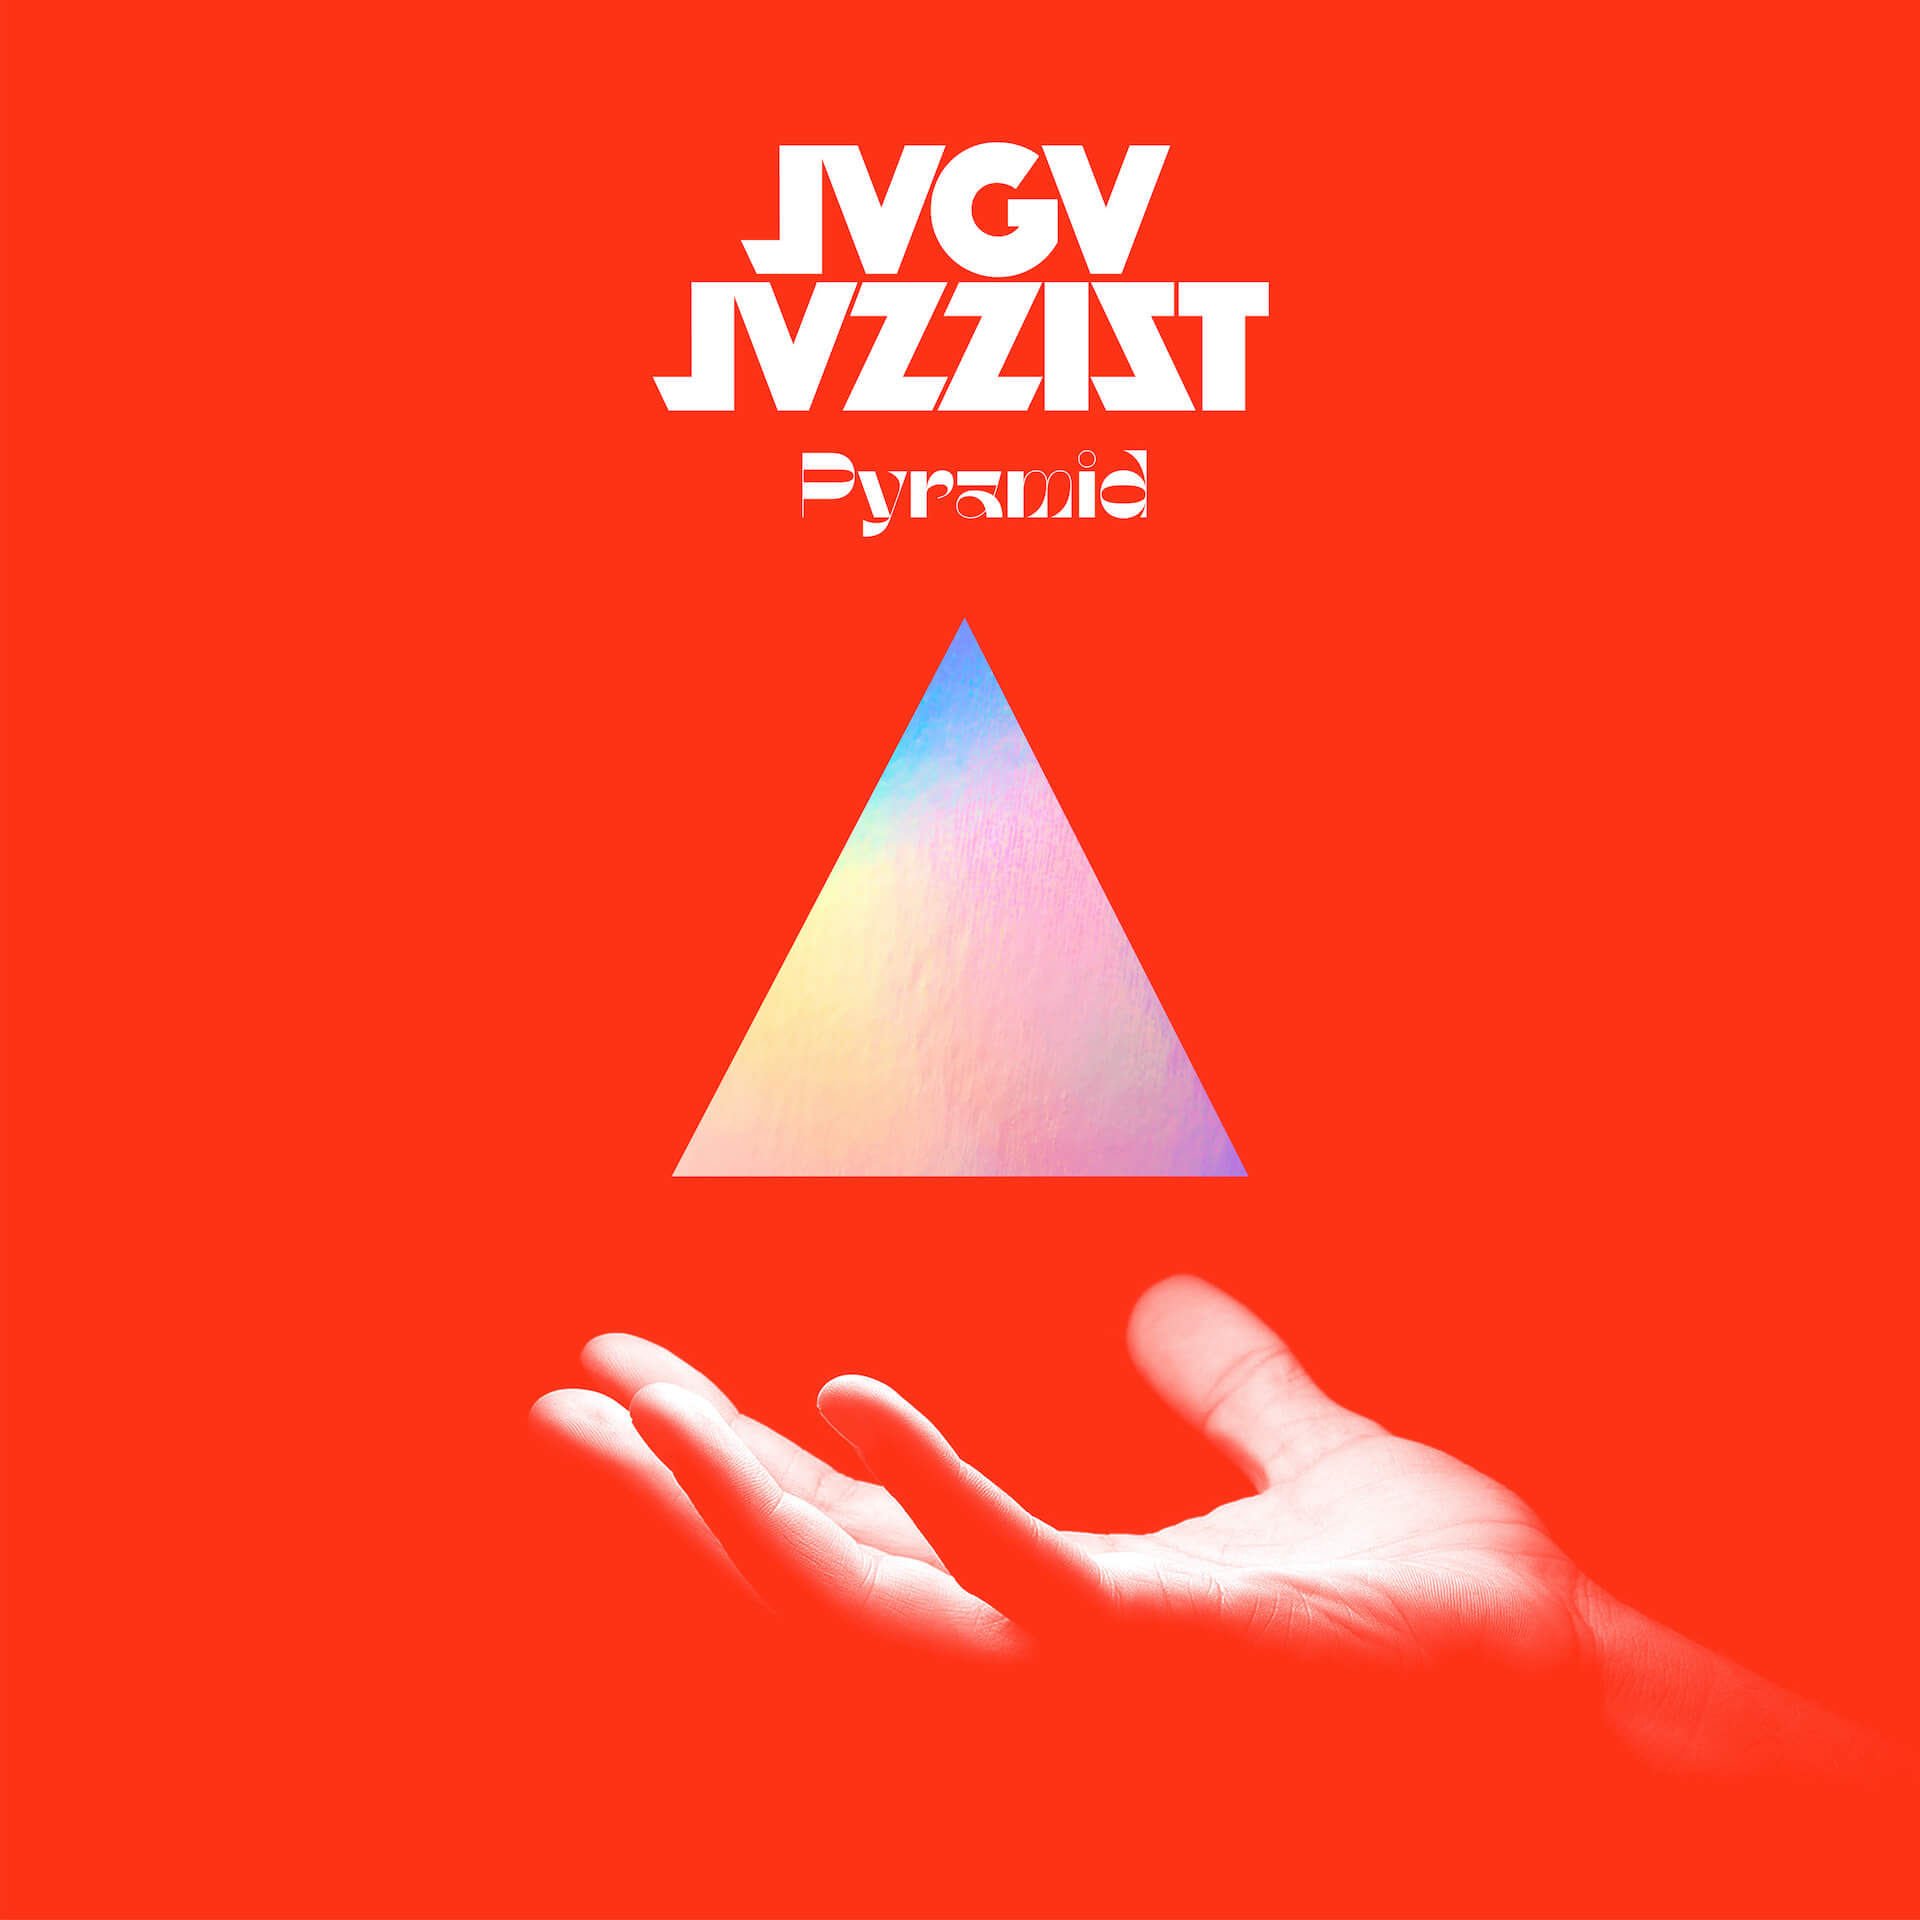 "JAGA JAZZIST最新アルバム『Pyramid』収録曲""SpiralEra""のPrins Thomas Remix版音源が公開! music200623_jagajazzist_02"